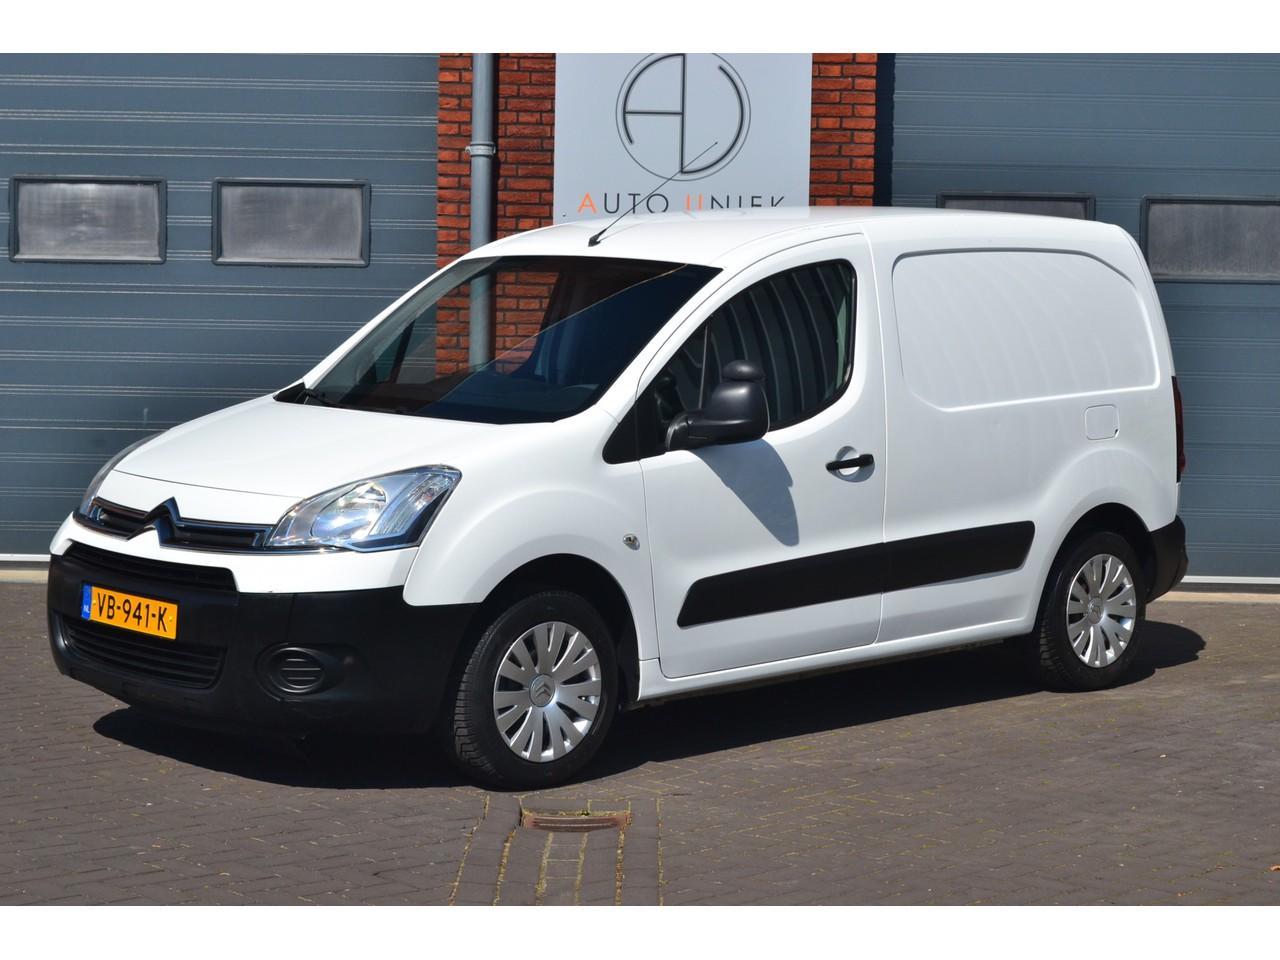 Citroën Berlingo 1.6 hdi 500 club economy, 3 zits, airco, schuifdeur, 41.251km nap